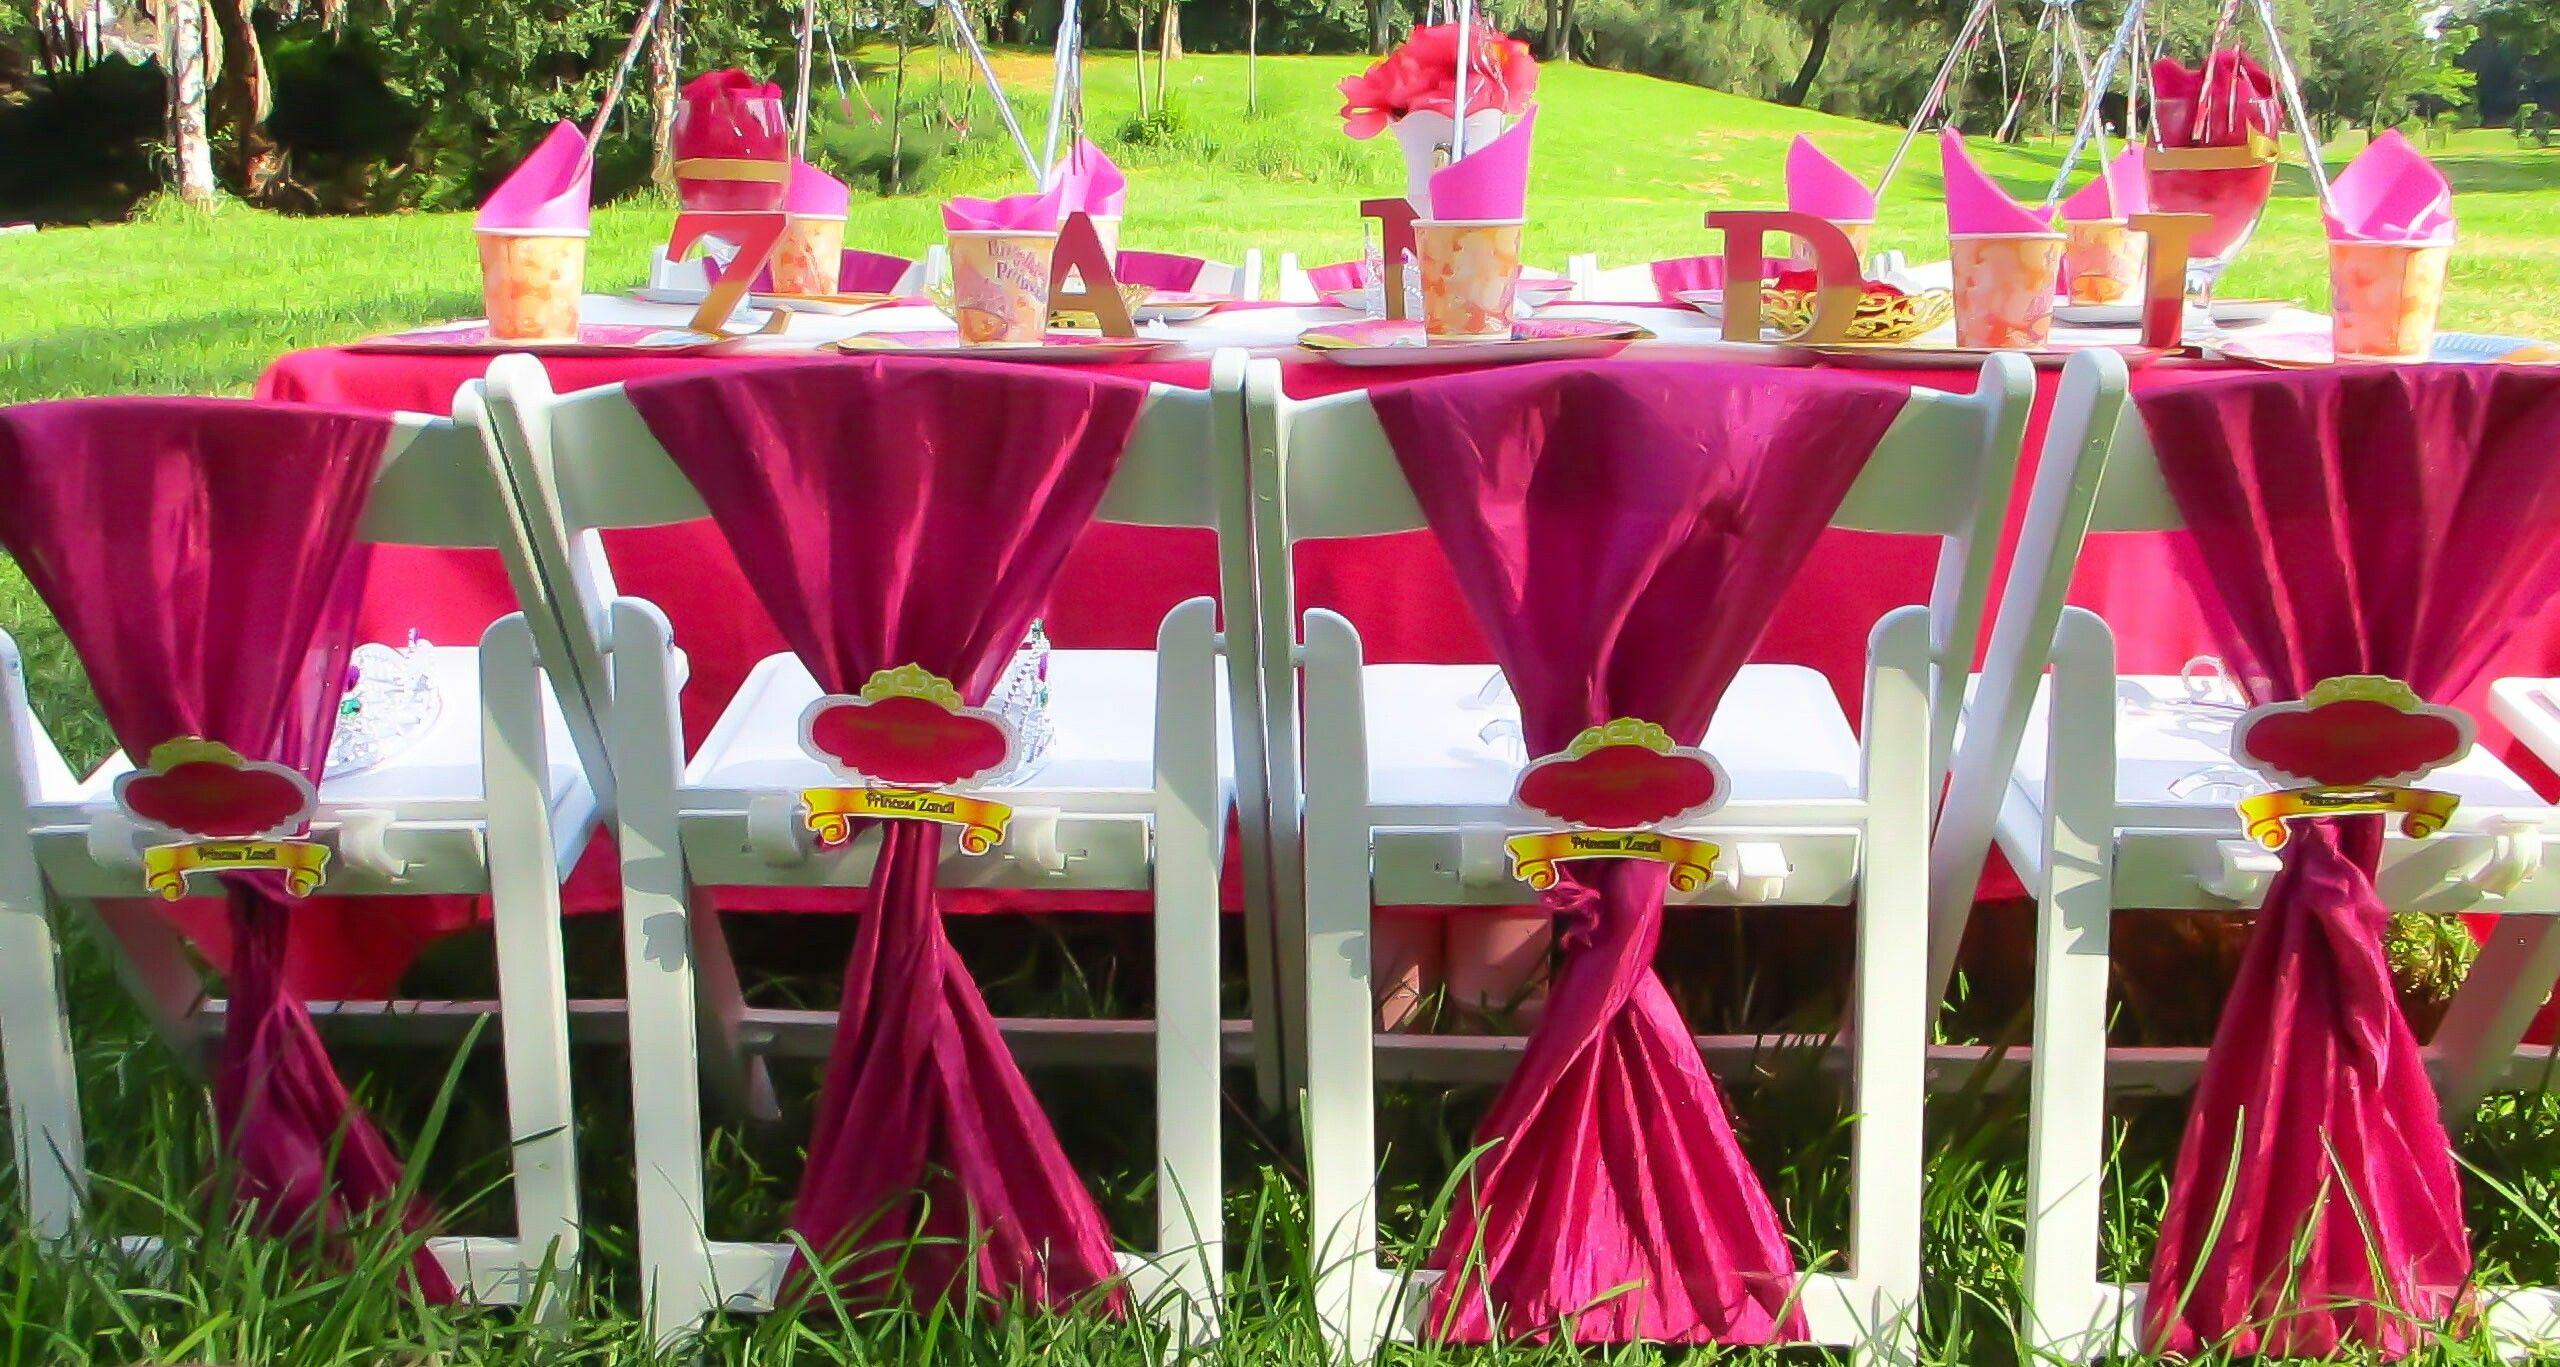 Kids Wimbledon Chairs Princess Party Decor Princess Party Decorations Party Decorations Party Themes